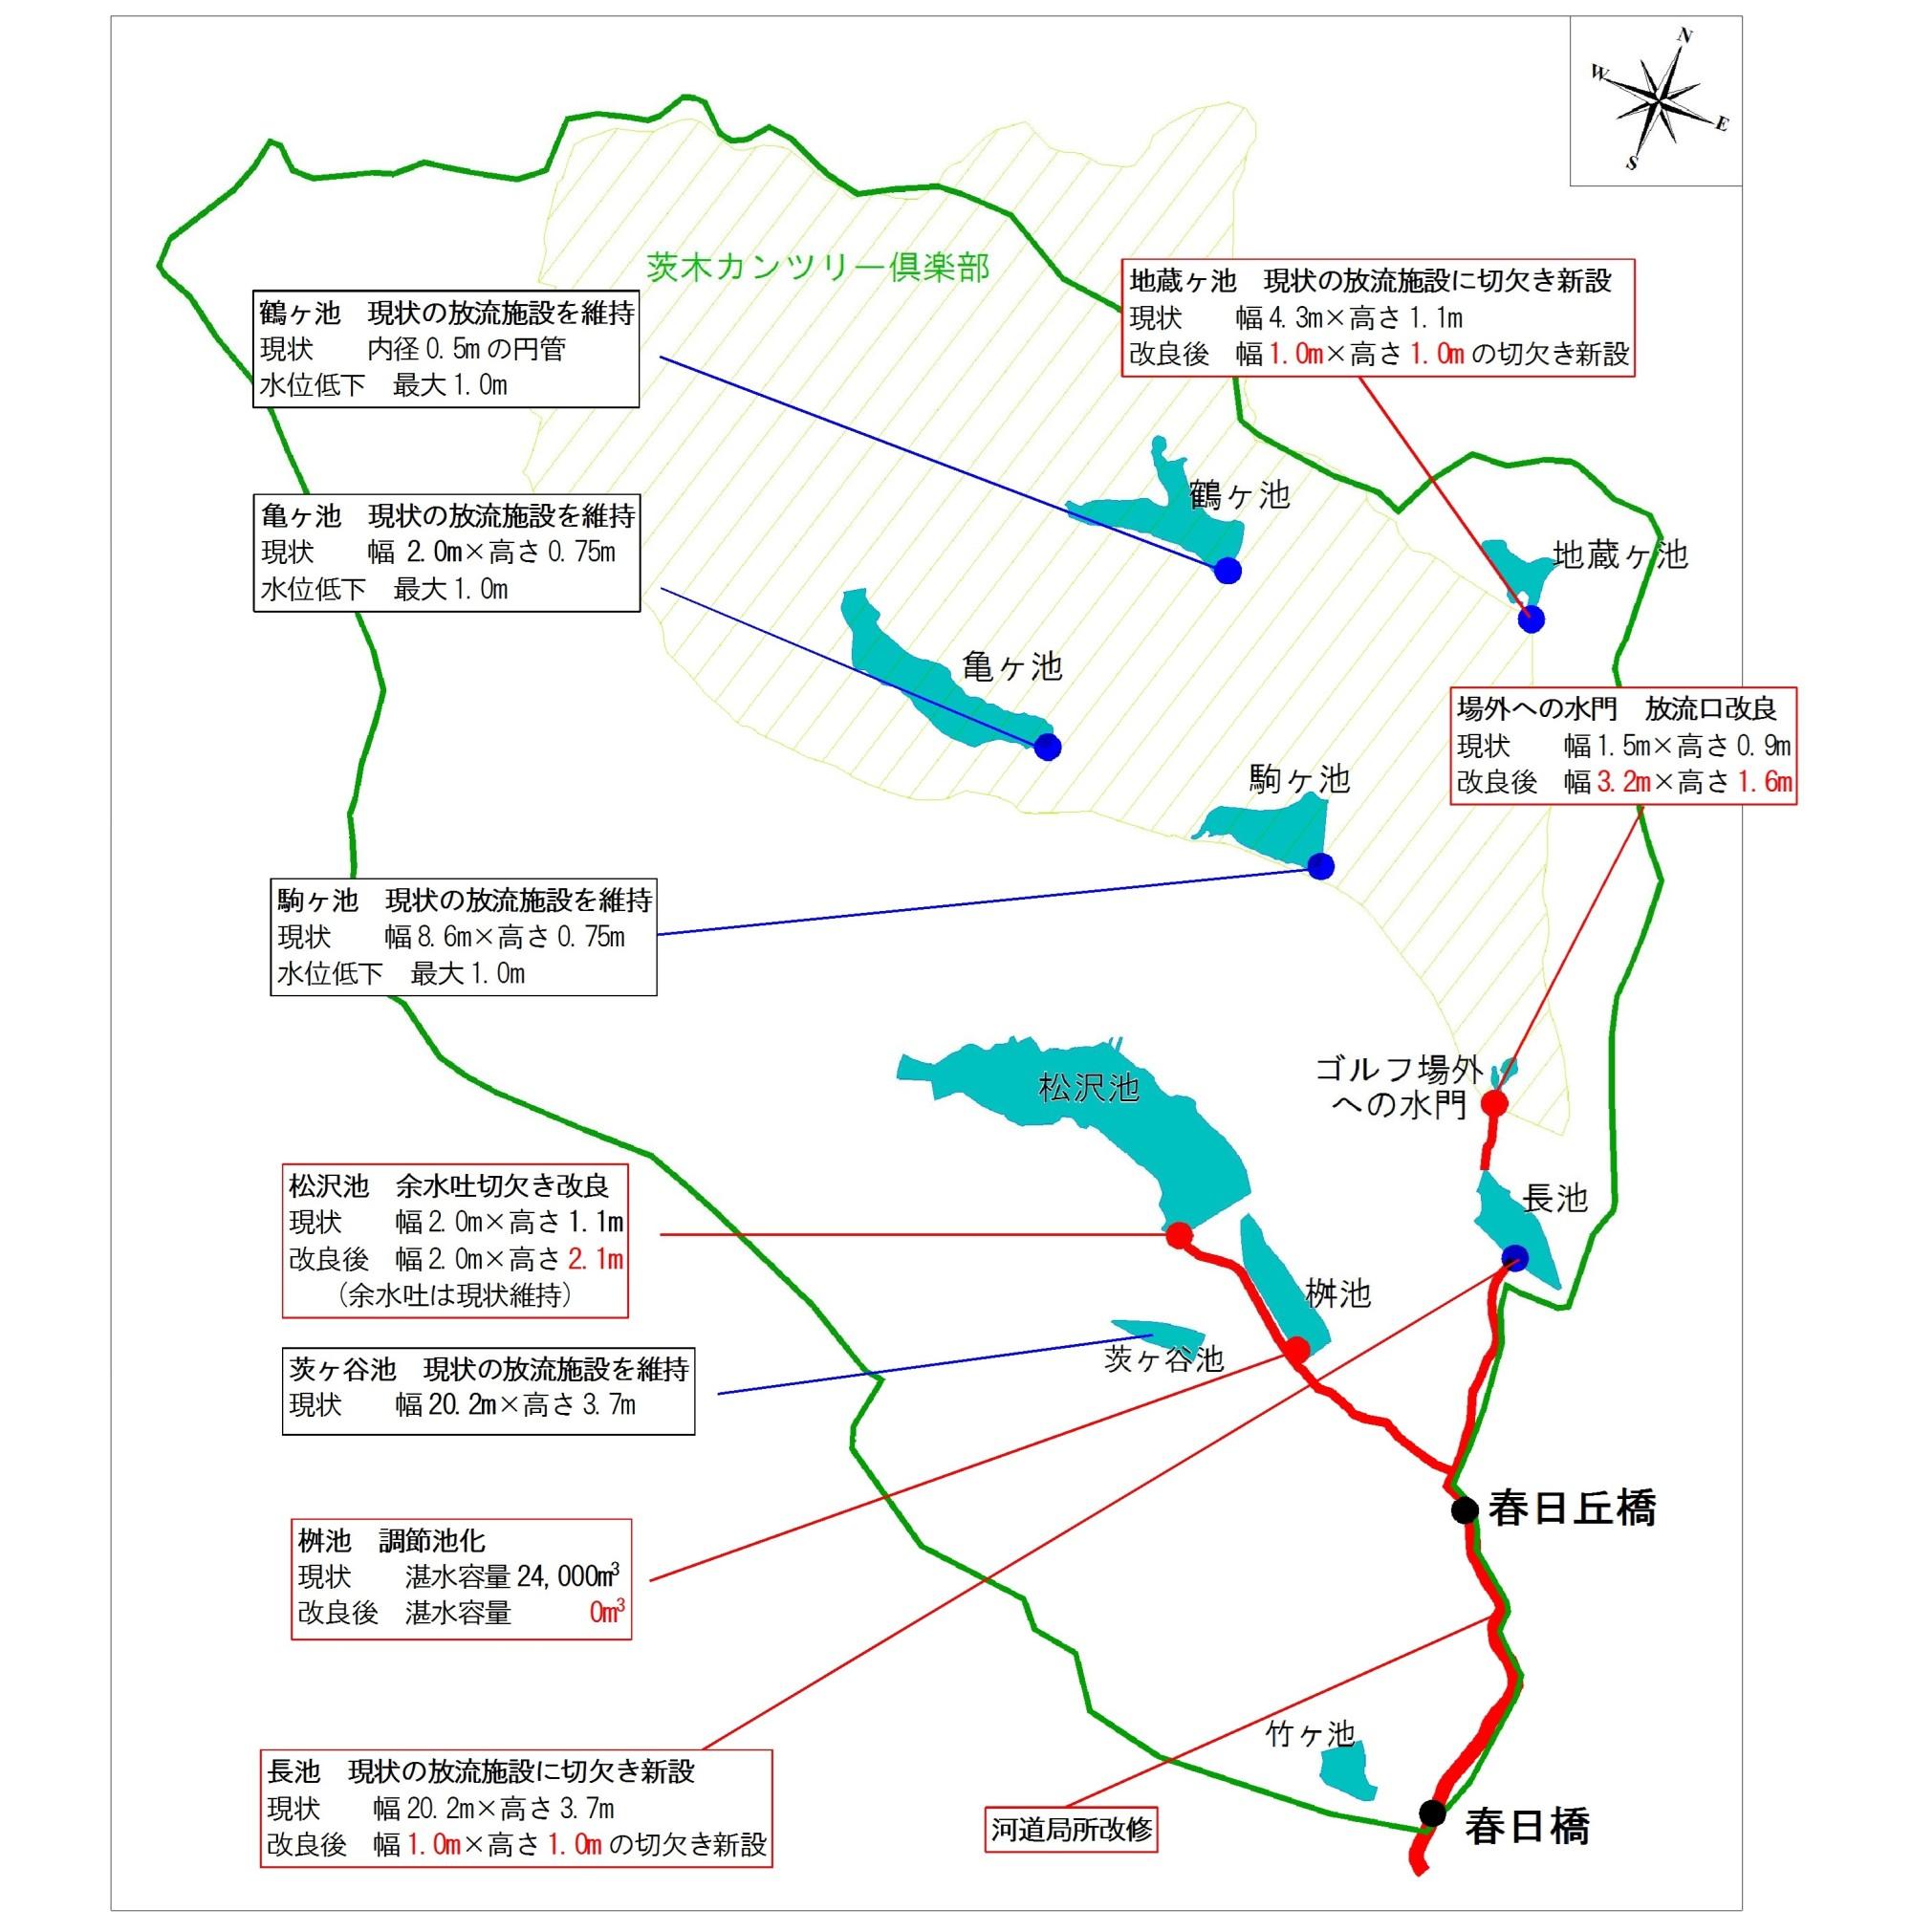 三重県の二級水系一覧 - JapaneseClass.jp